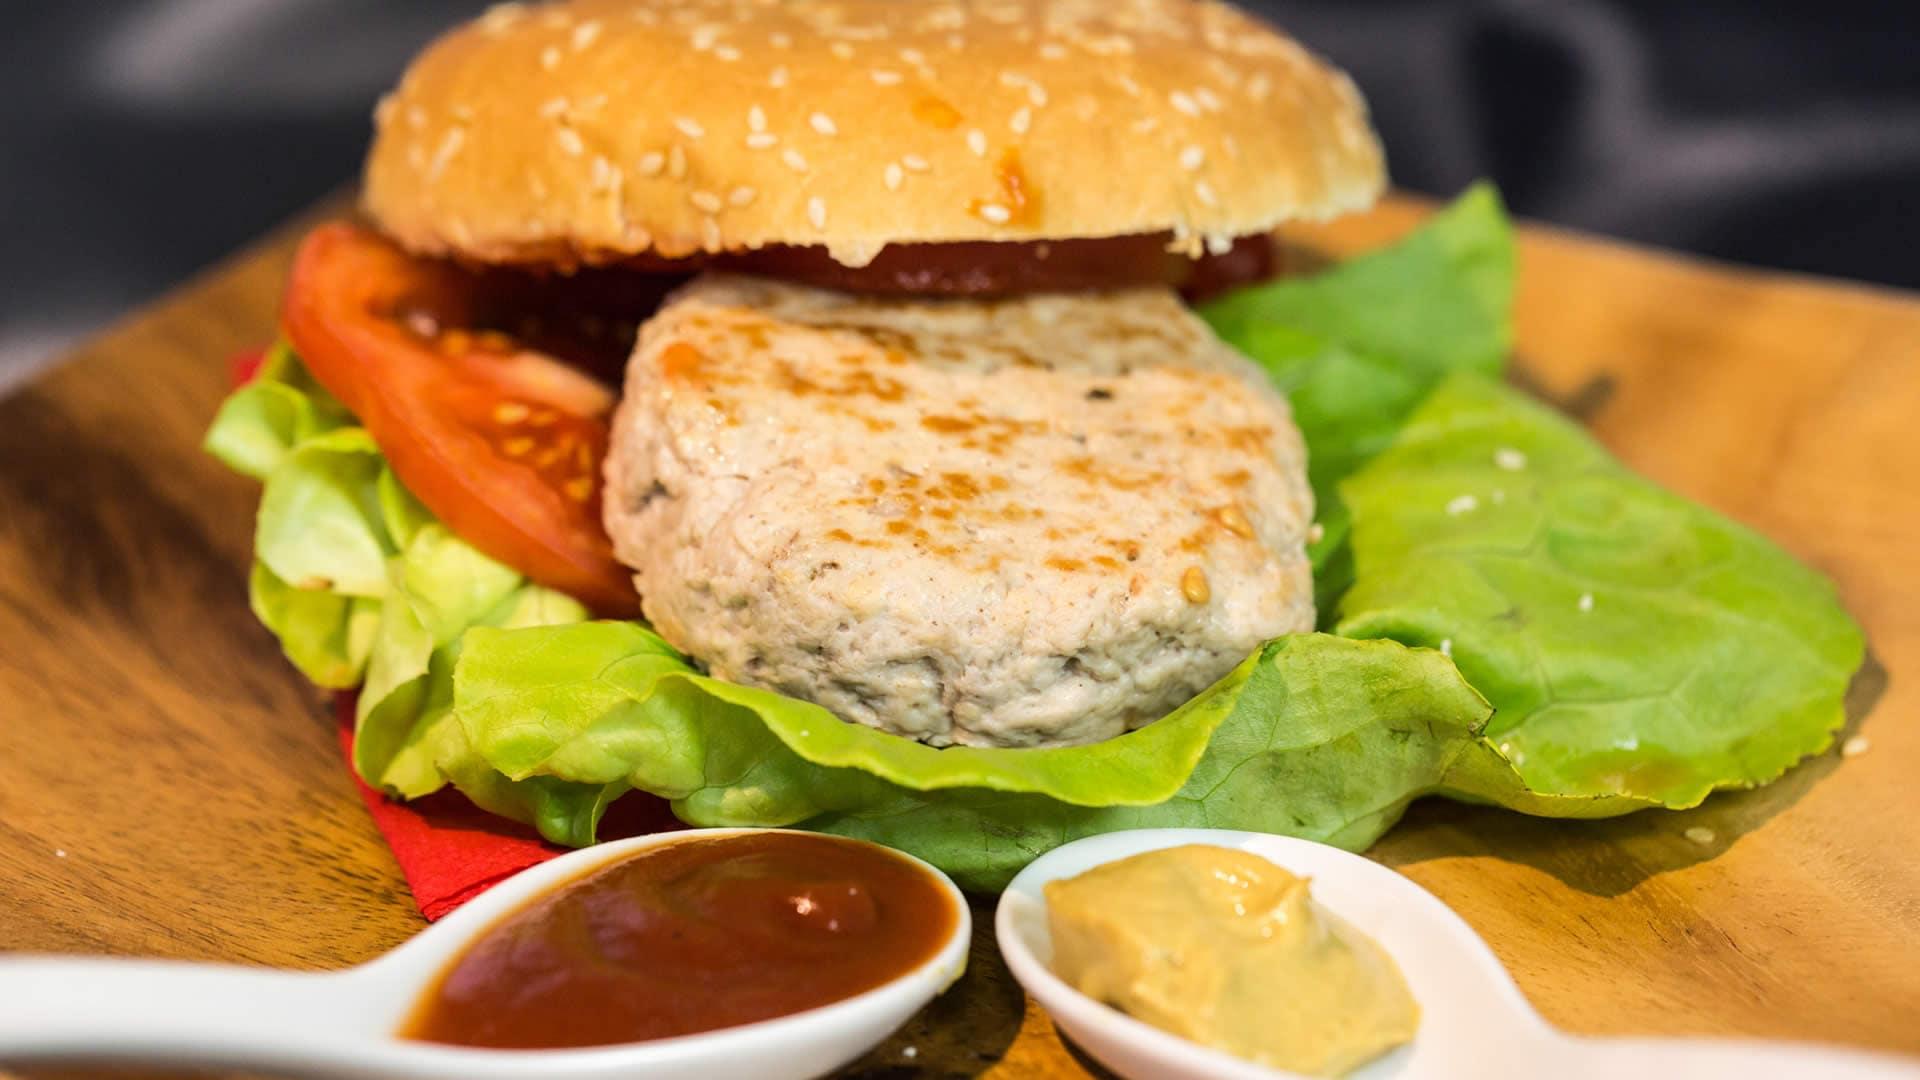 Foto Hamburger di Carne Fatti in Casa